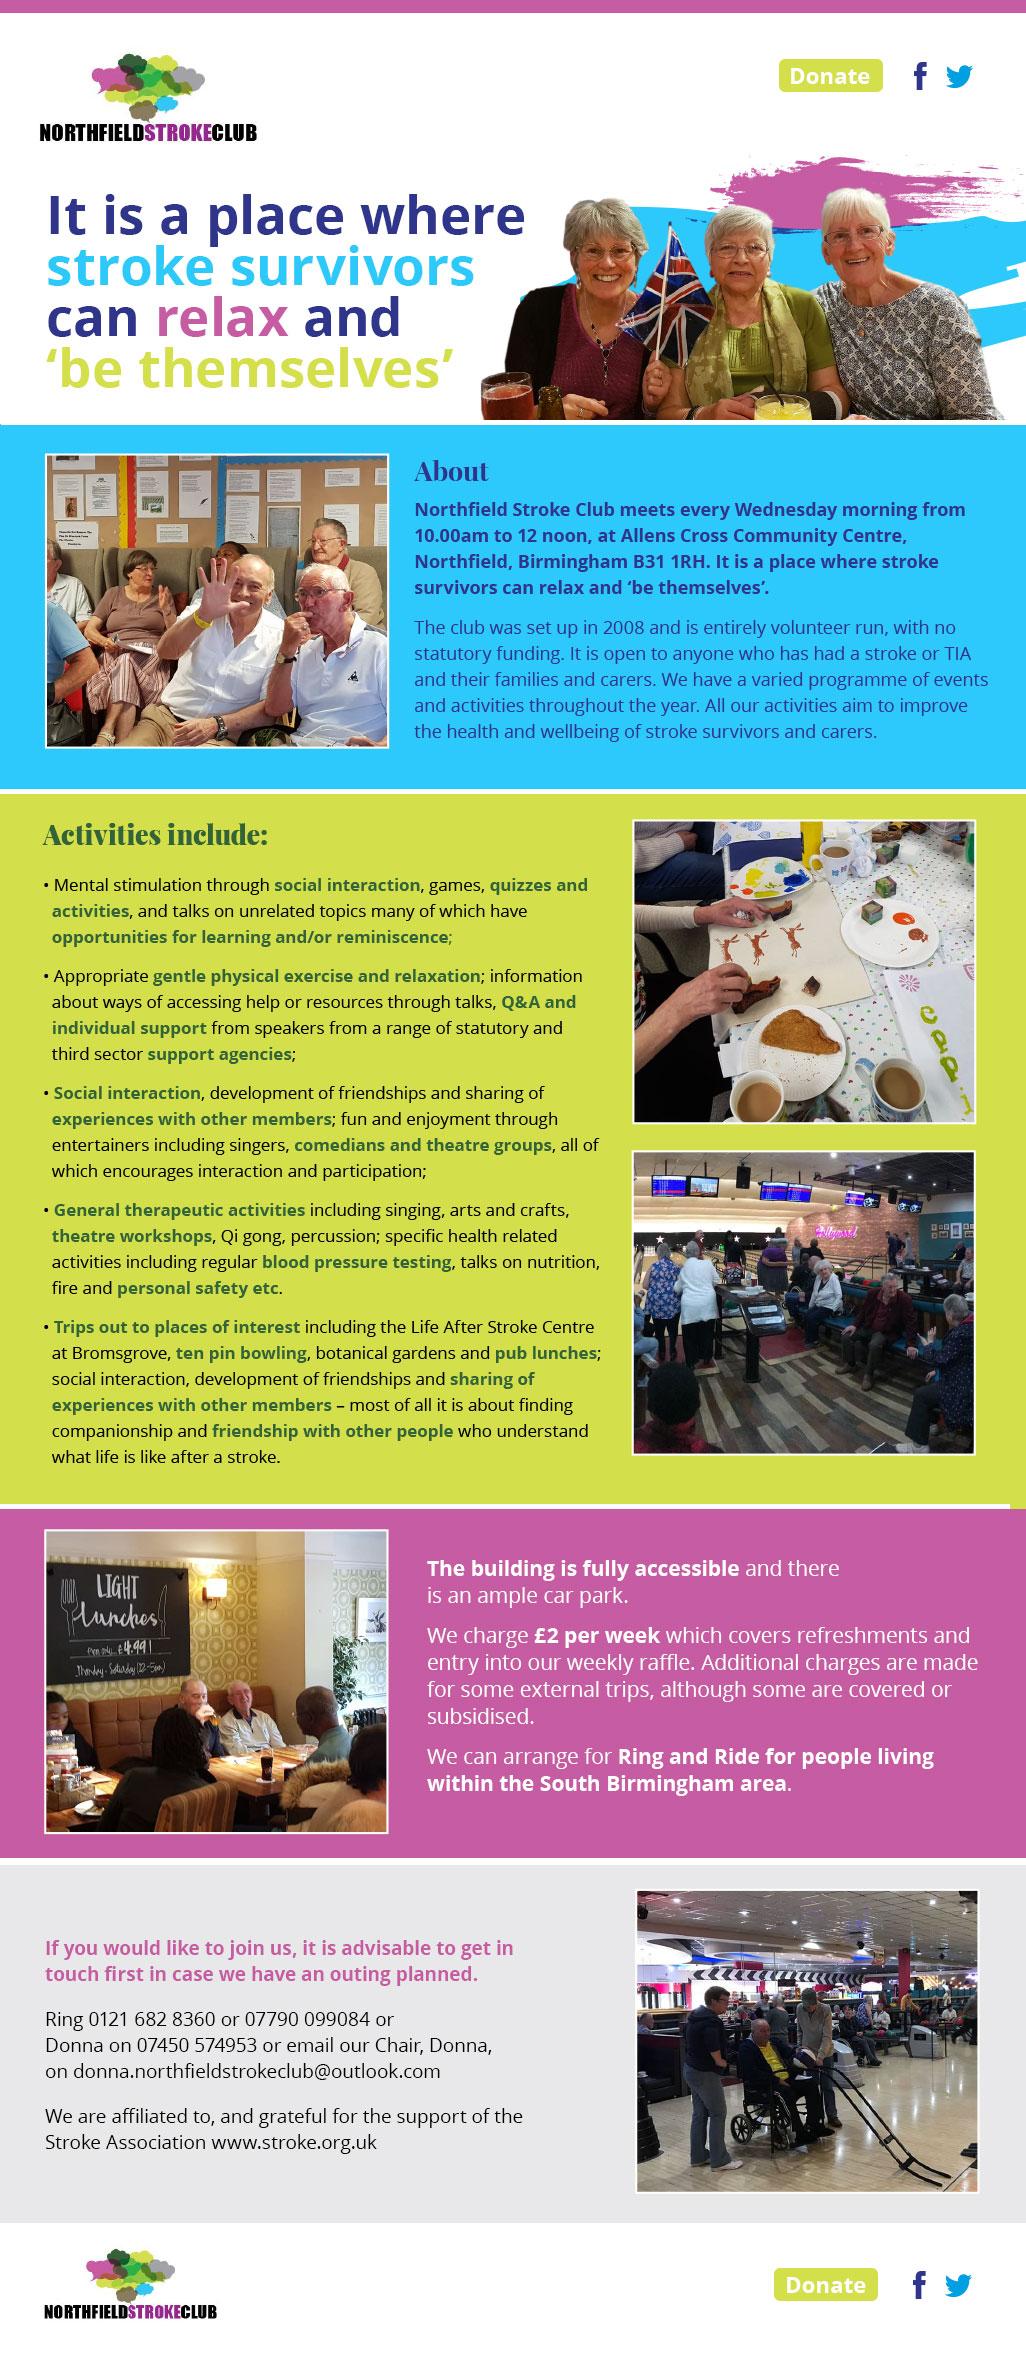 https://www.boostdigitalmedia.com/blog/project/website-design-for-northfield-stroke-club/